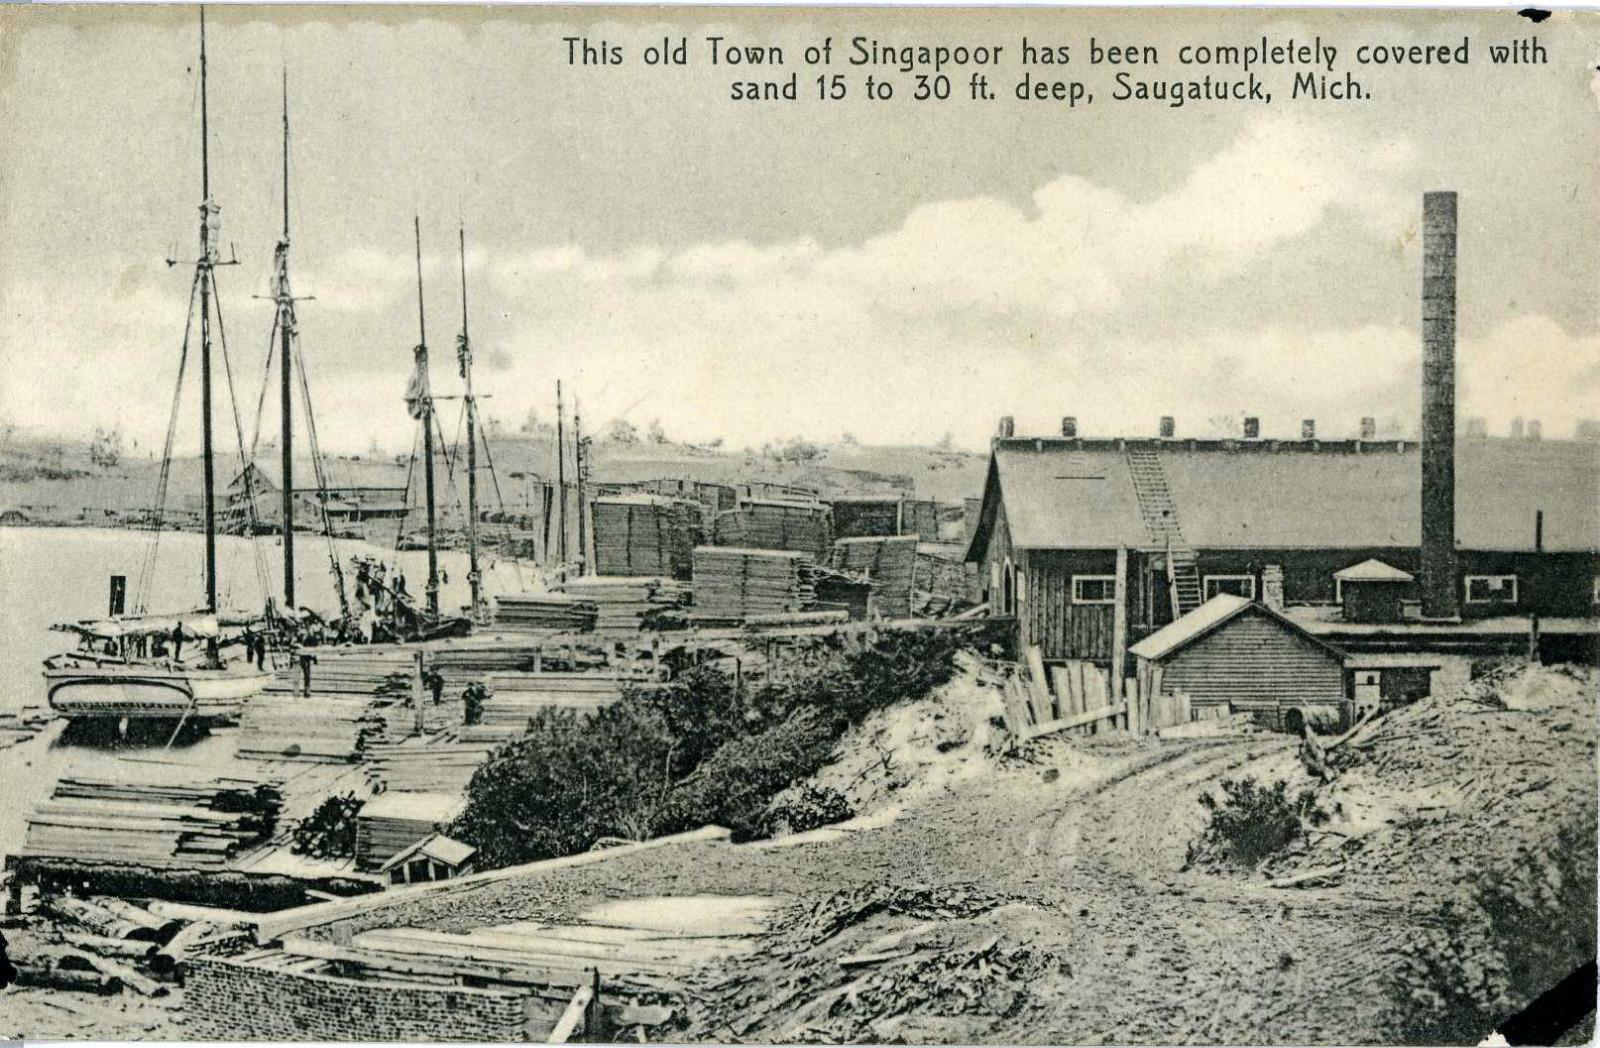 Historical photo of saugatuck